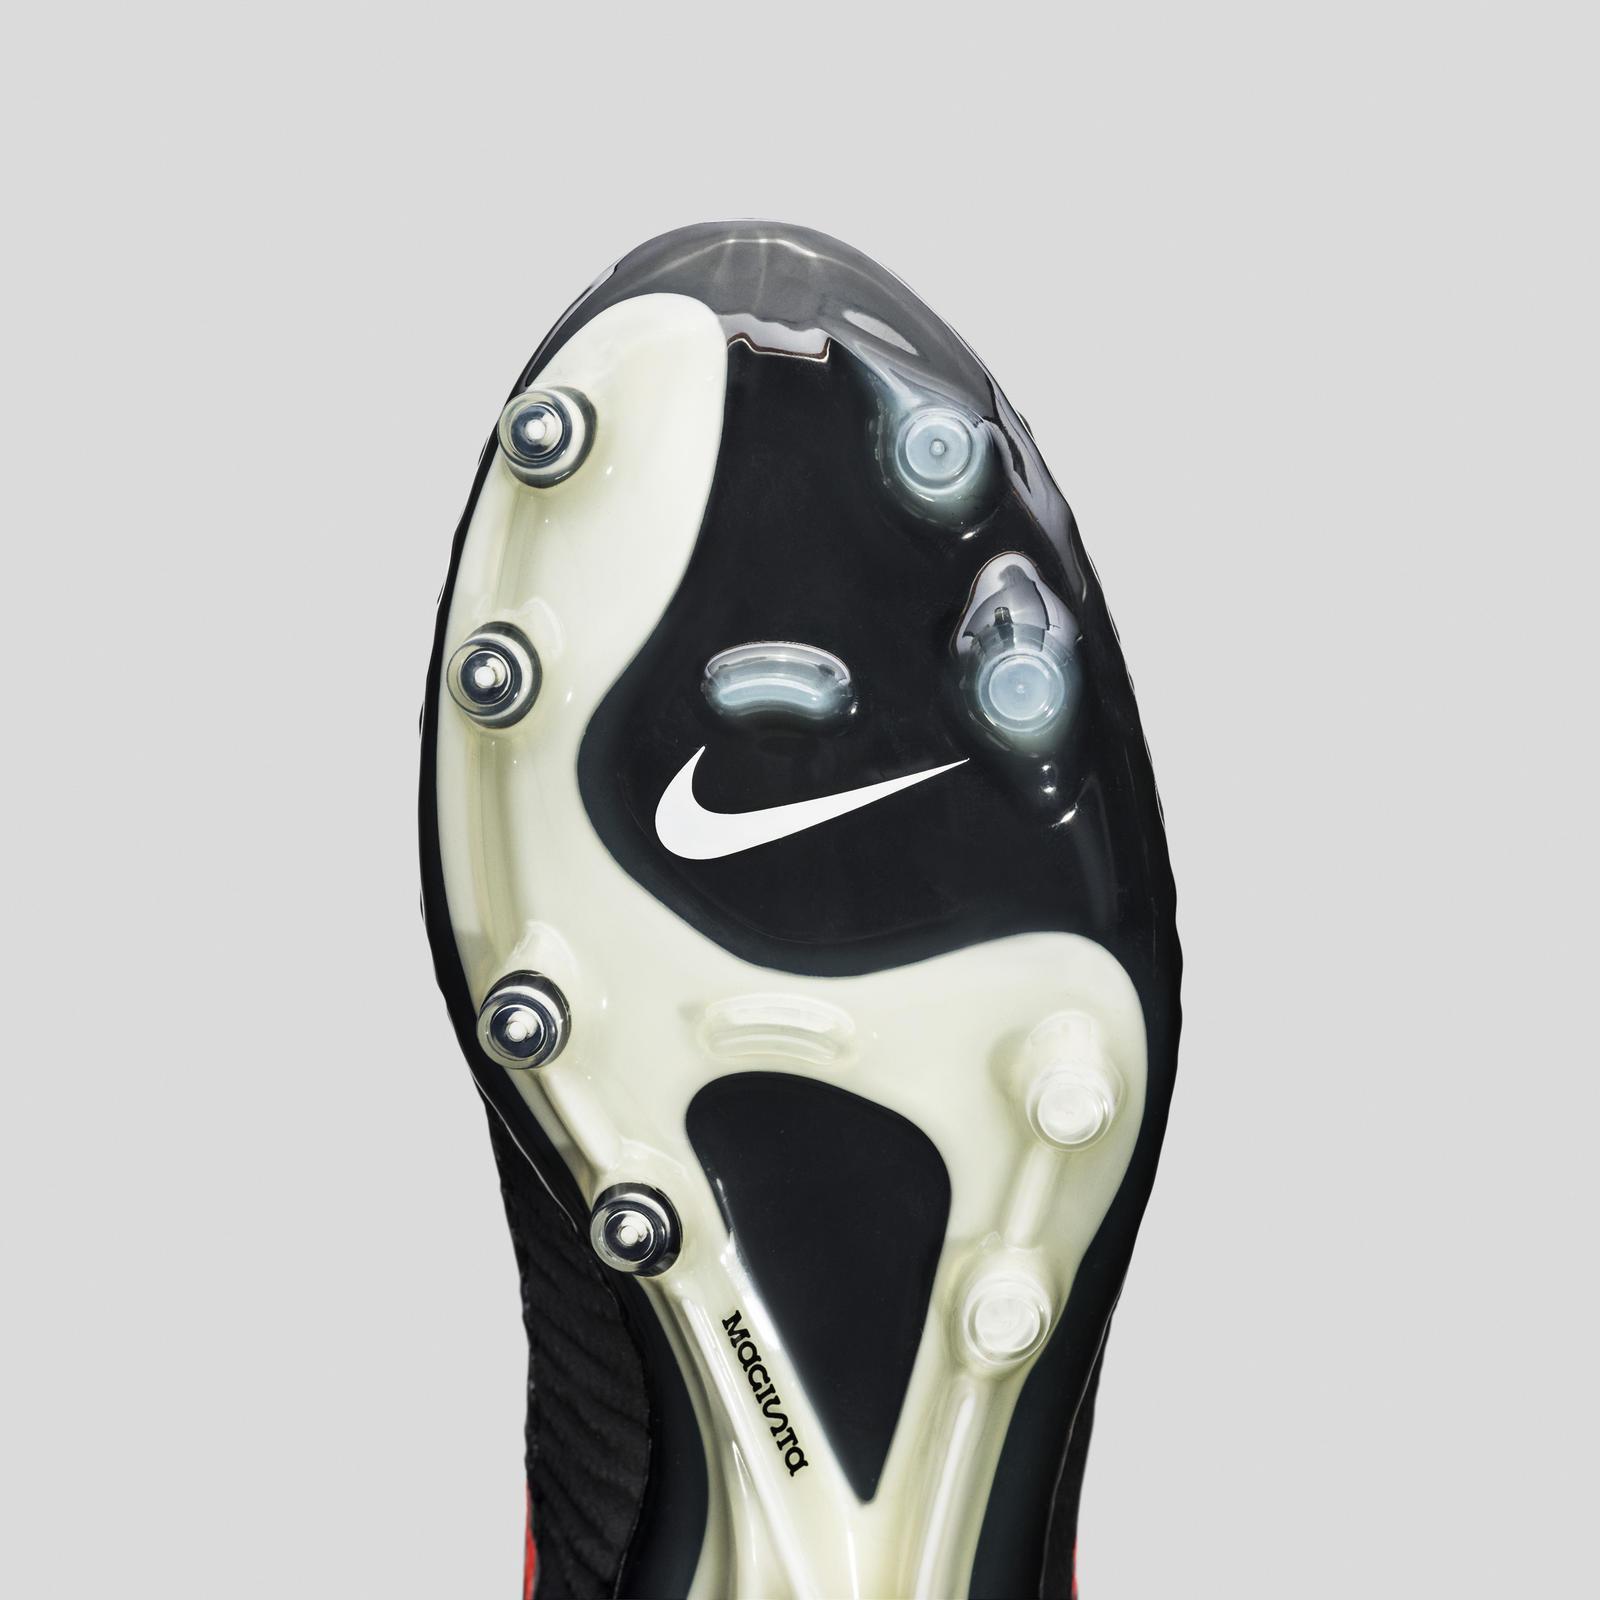 Nike Glbl Football Wmns Sp16 Mgsta Obra Plate